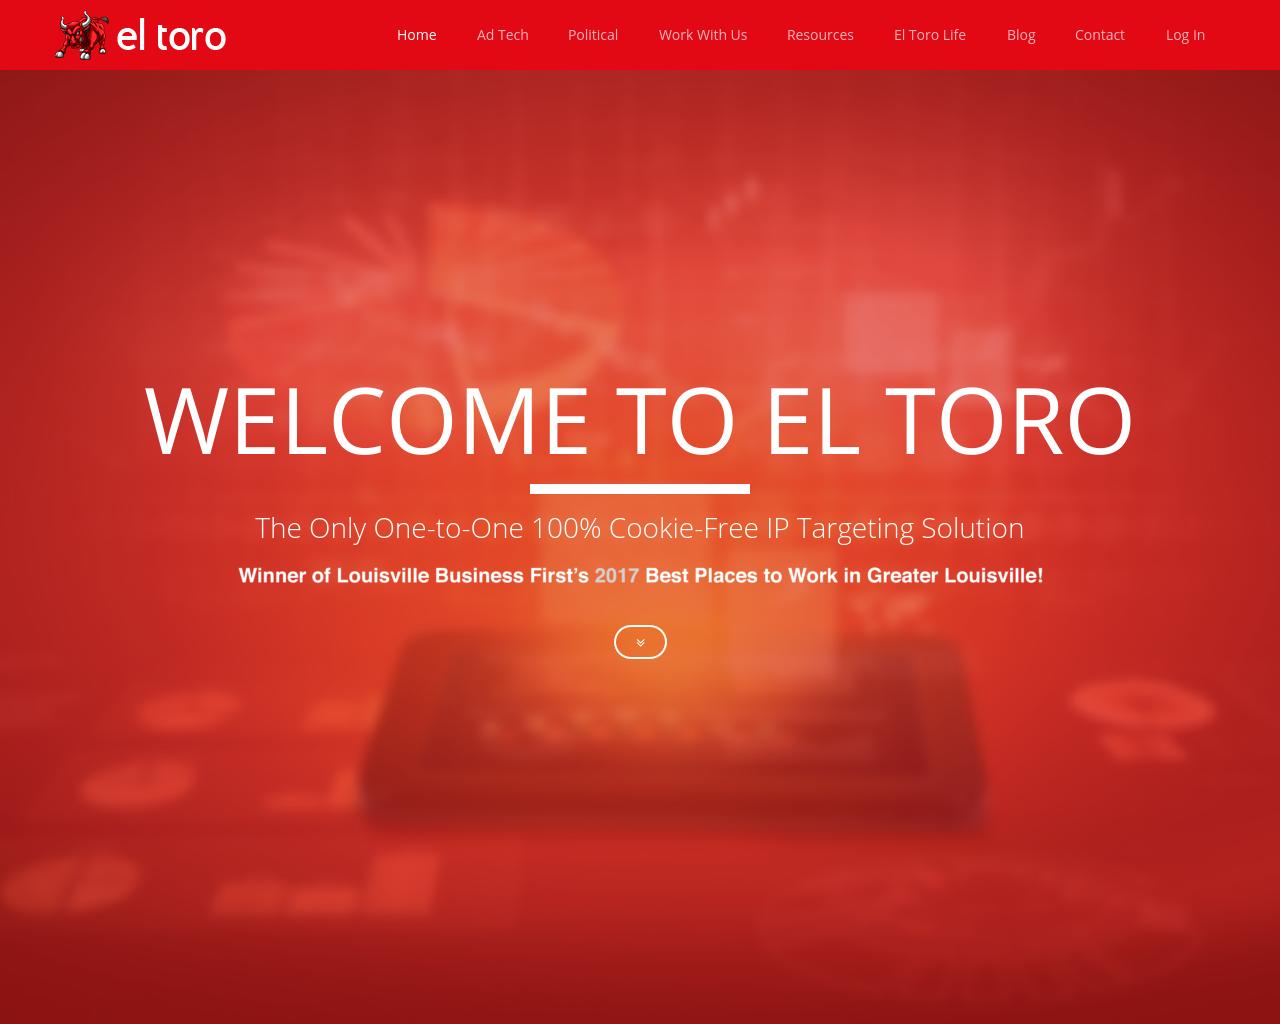 El-Toro-Ip-Targeting-Advertising-Reviews-Pricing